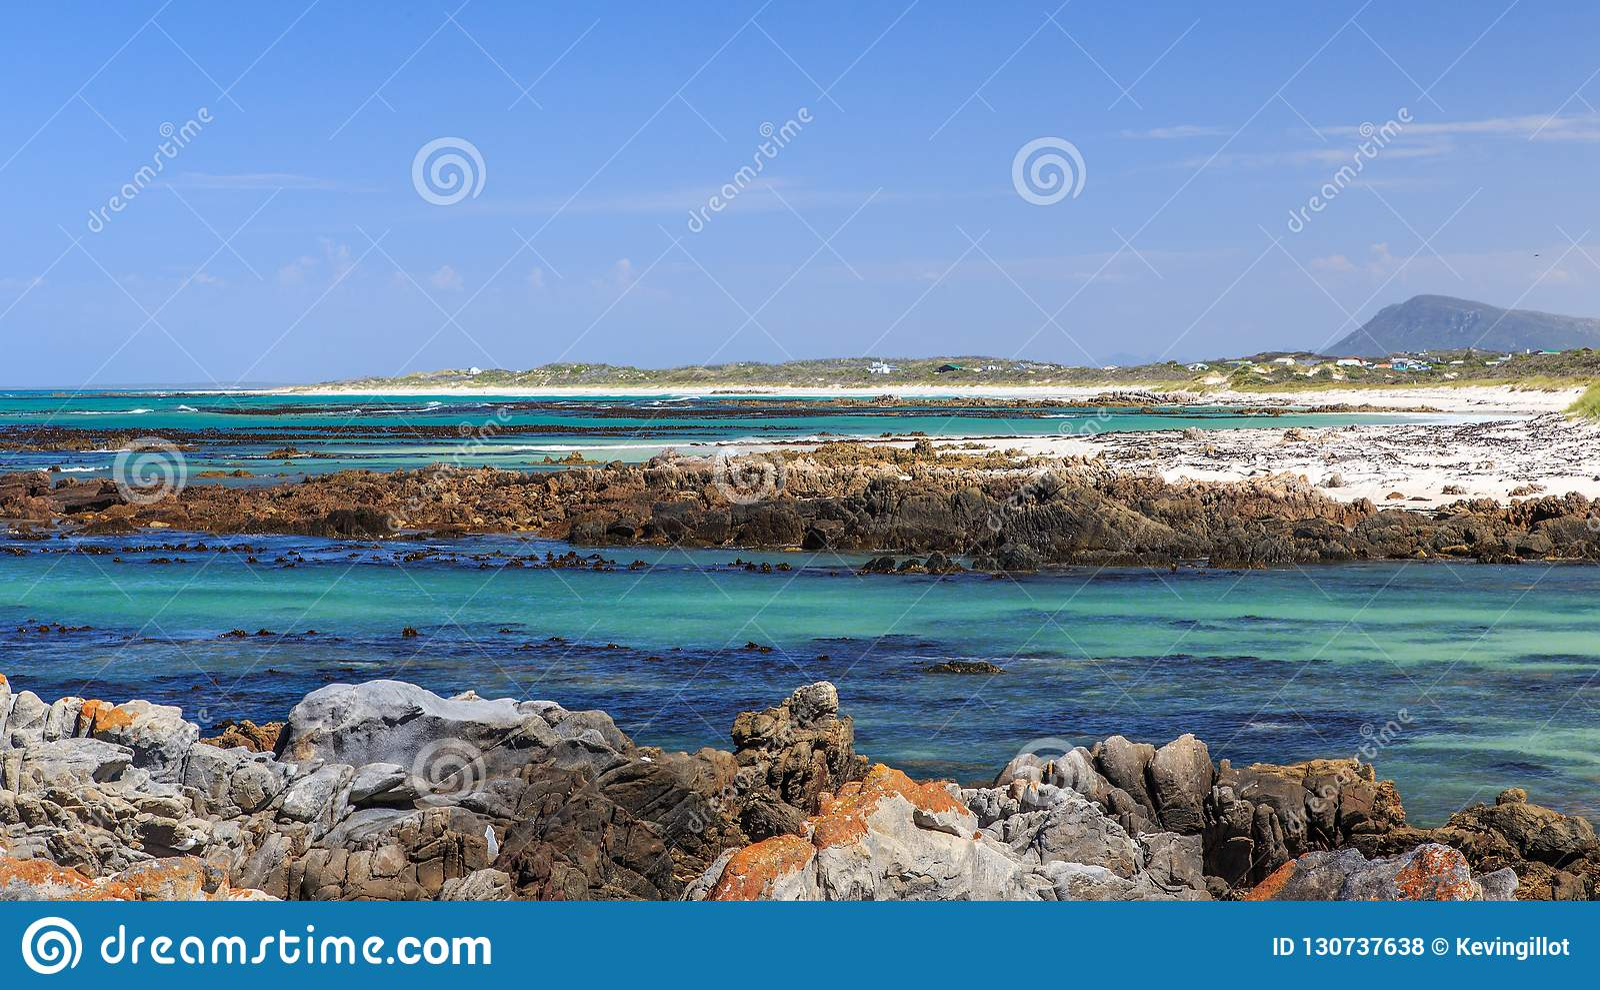 A rocky beach - Pearly beach - South Africa